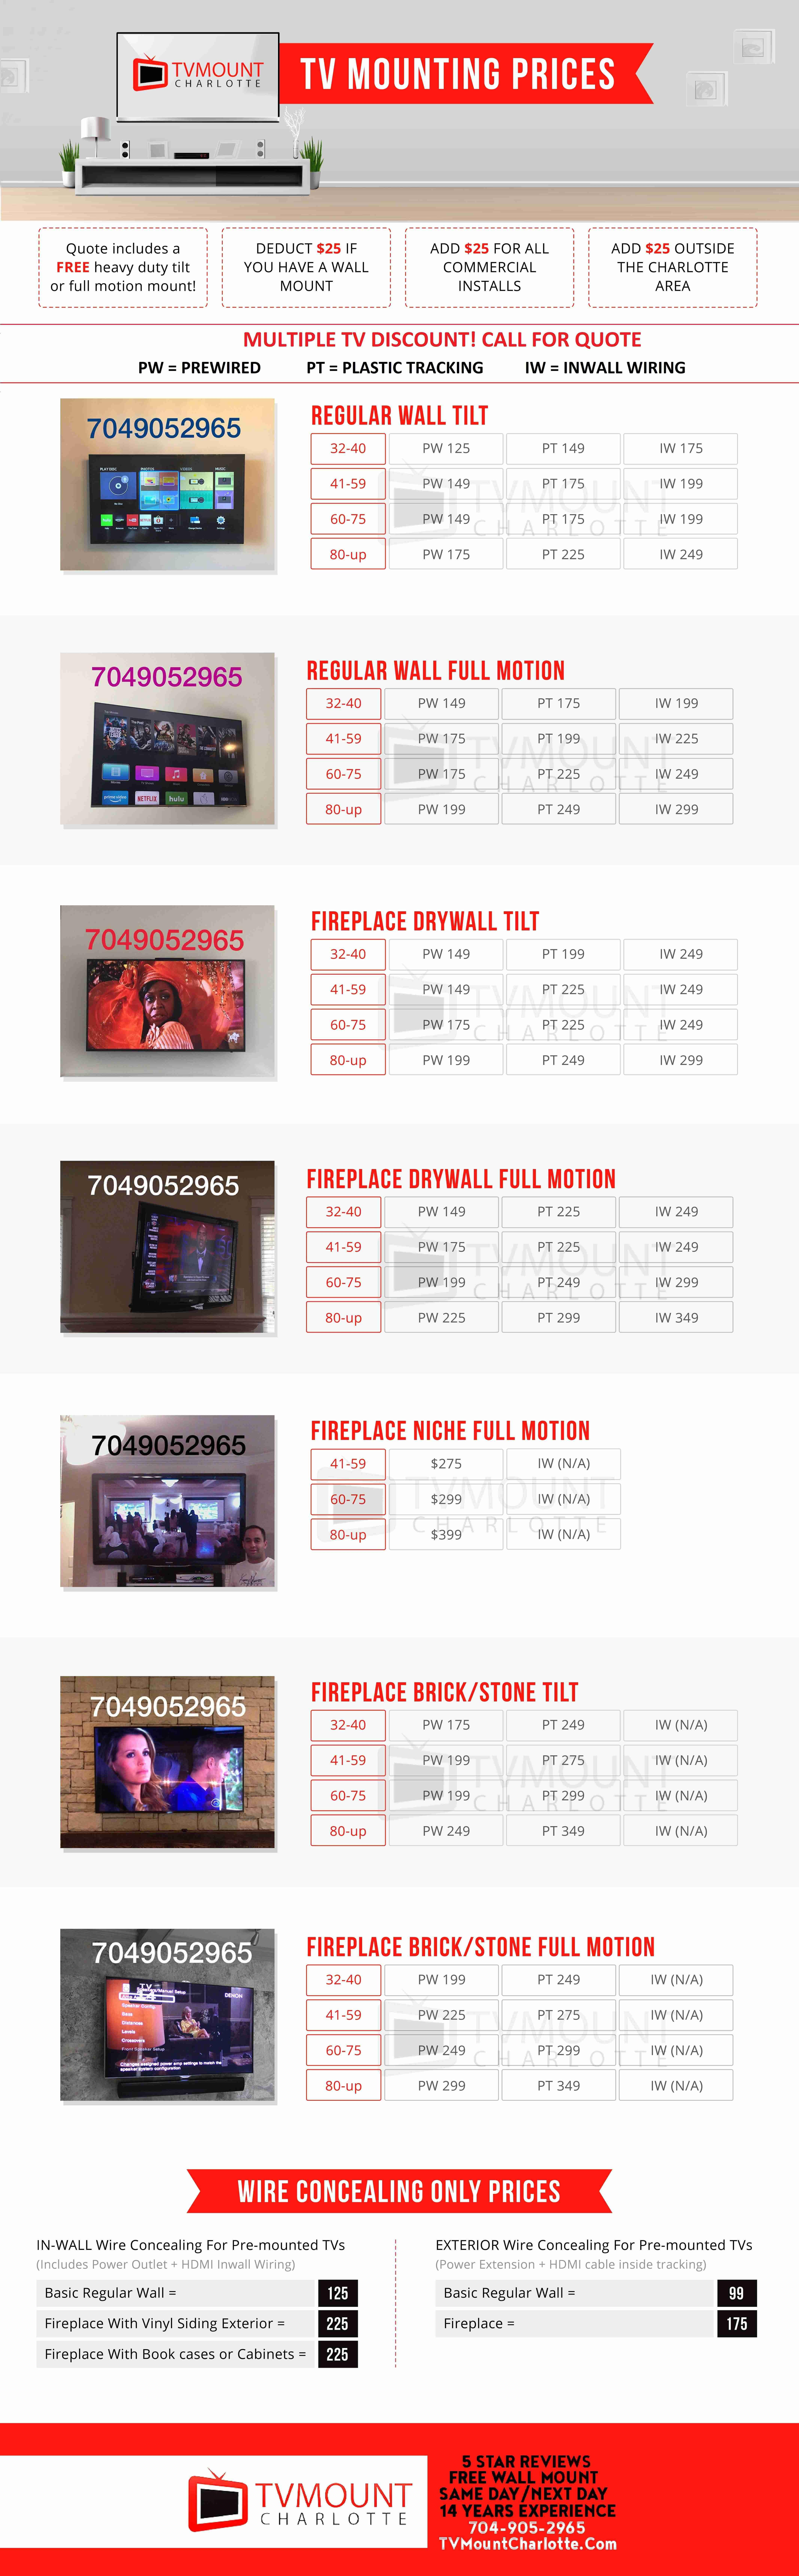 instant tv mount price quote chart